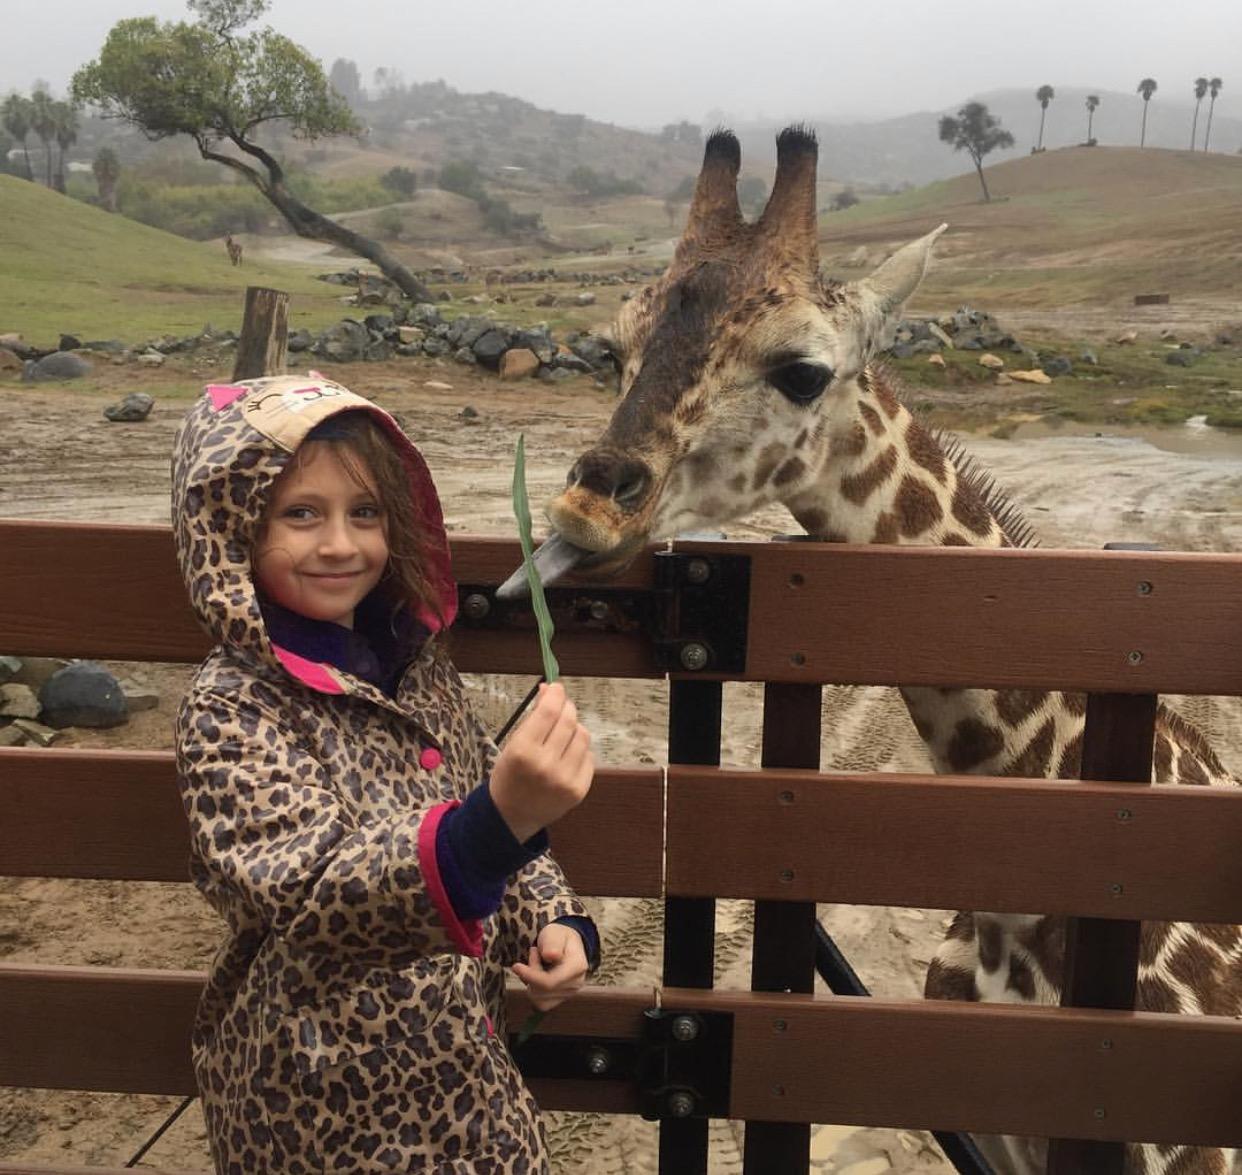 Eva feeding a giraffe